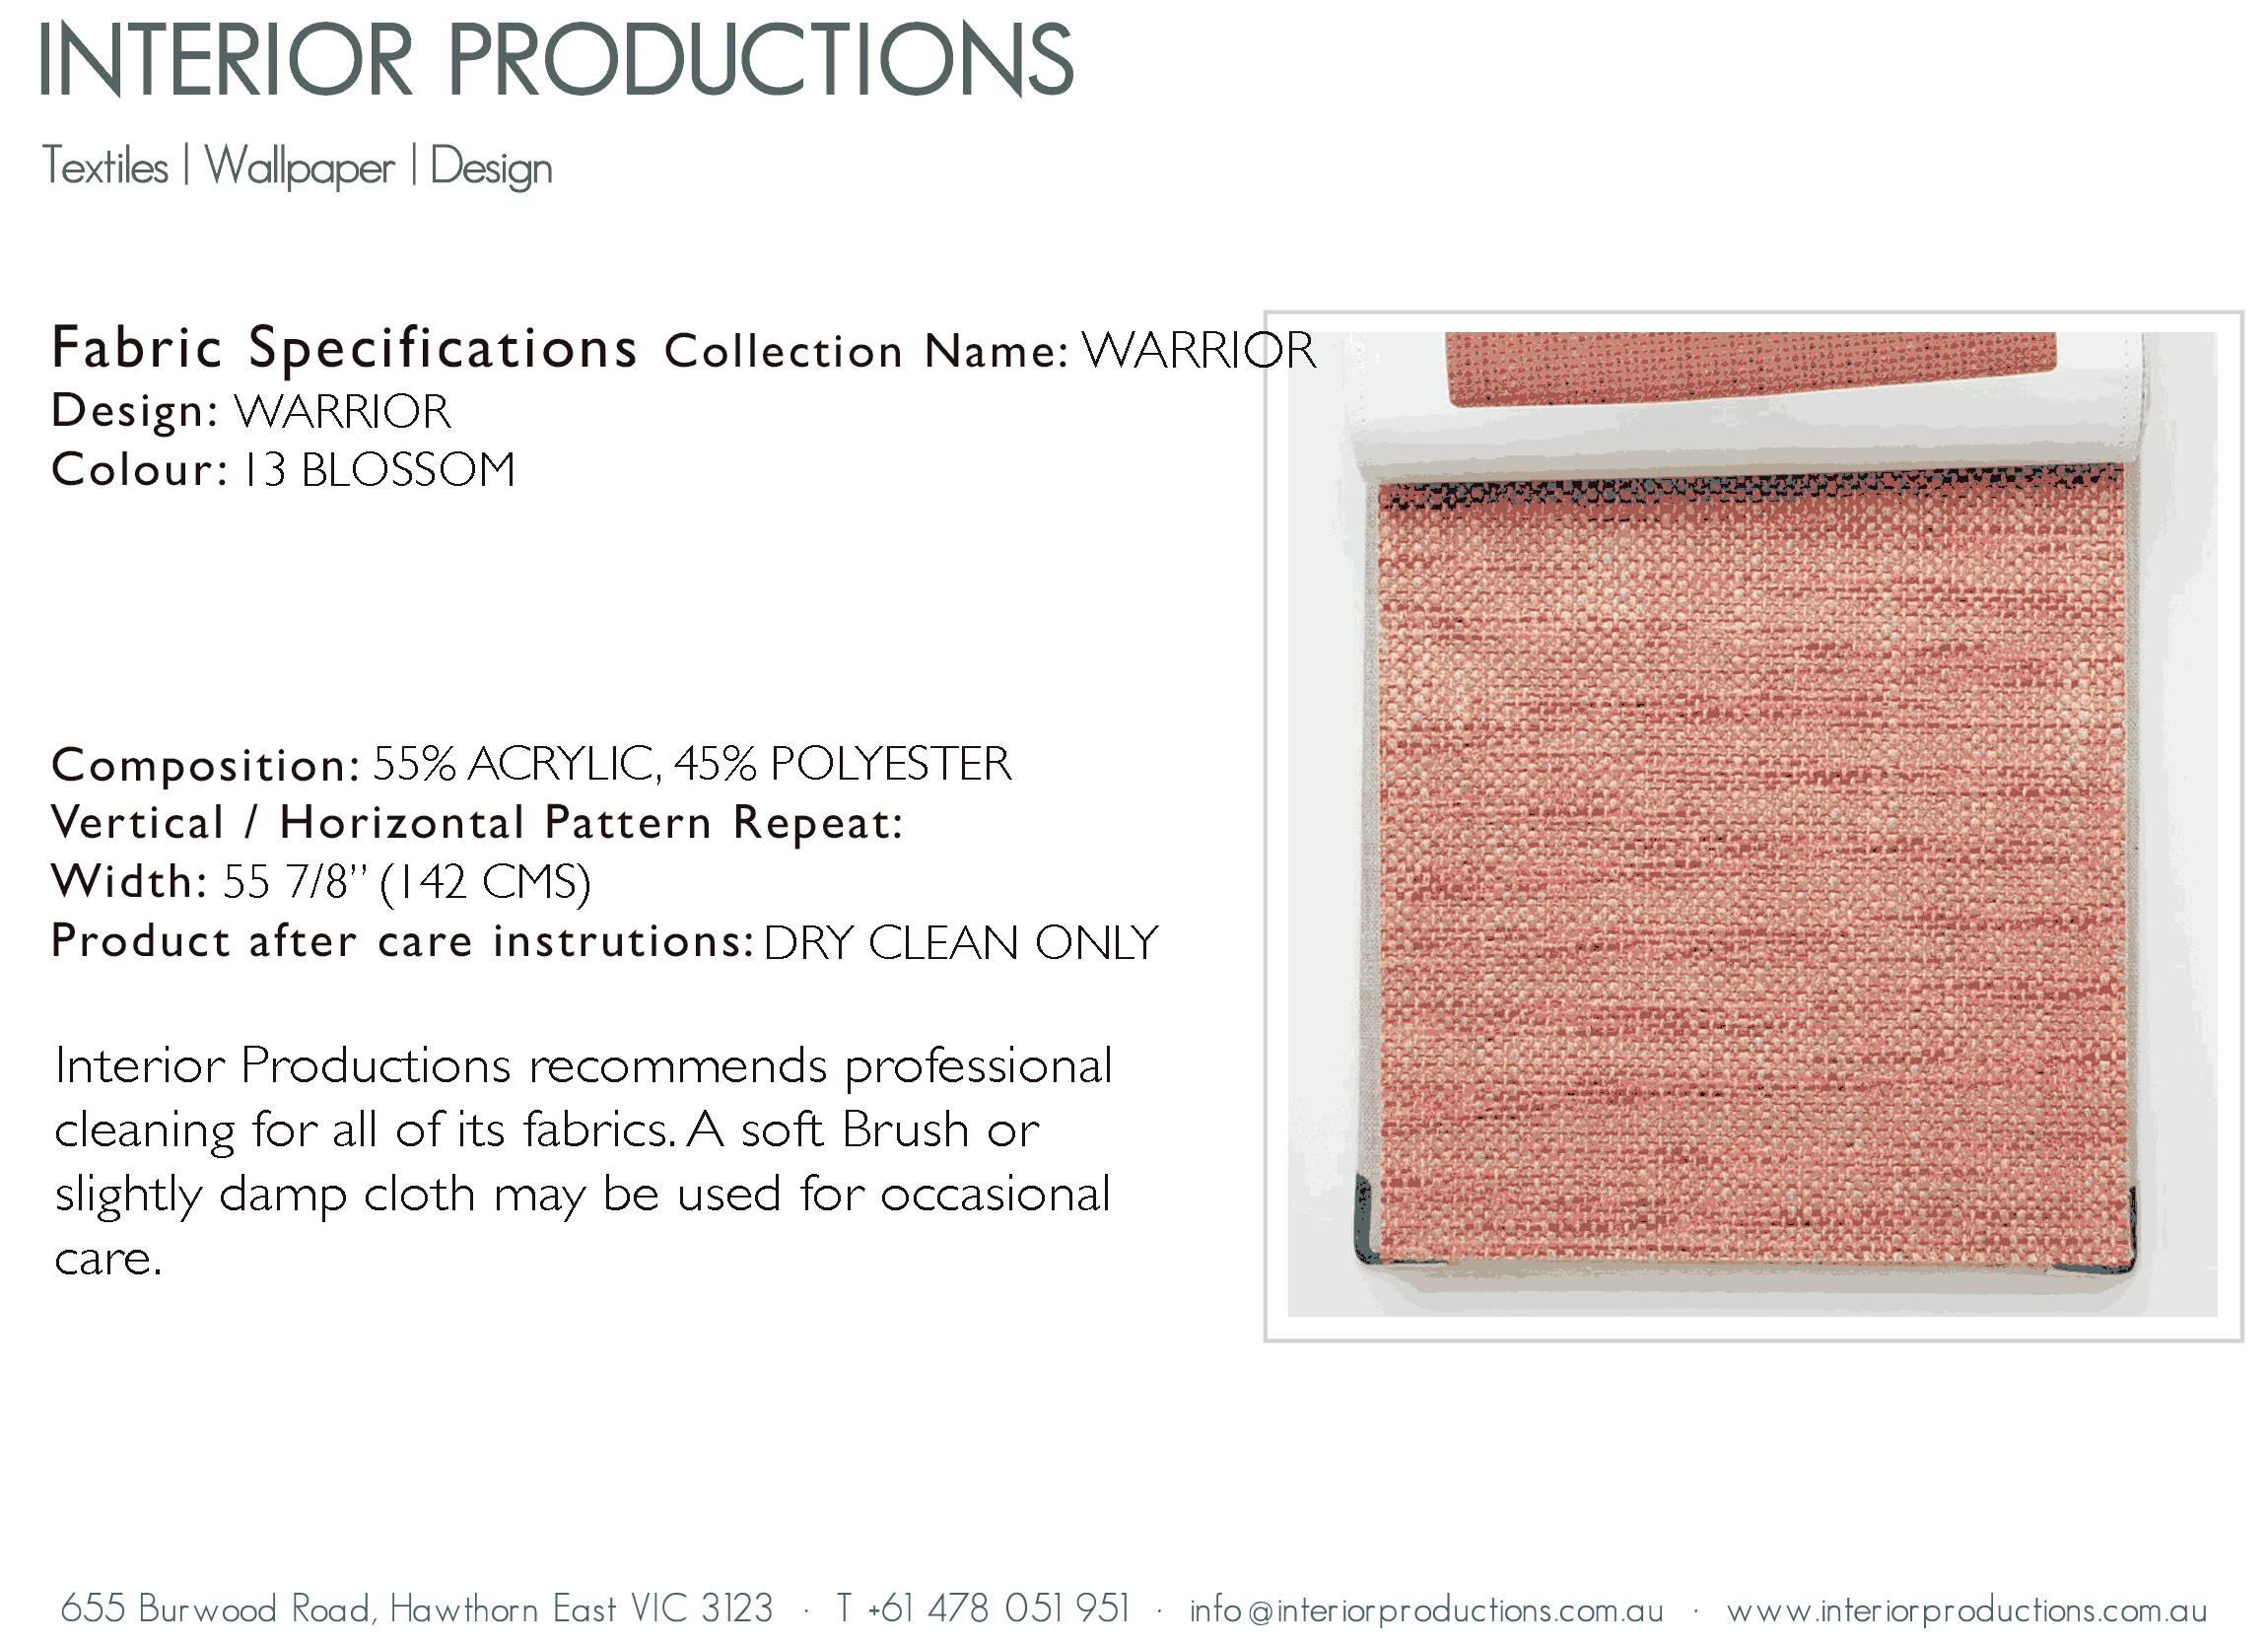 interior_productions_WARRIOR---13-BLOSSOM